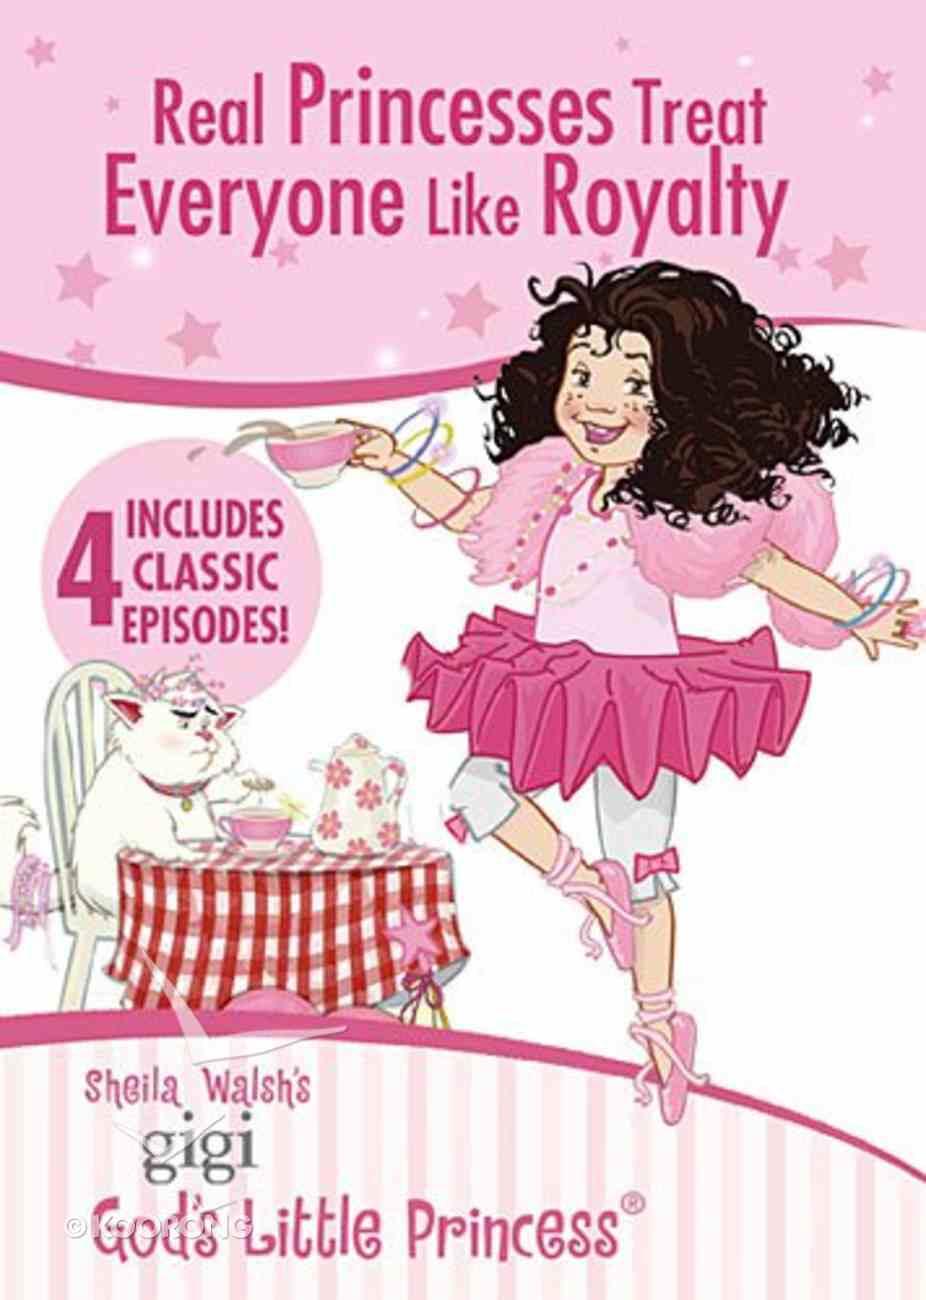 Real Princesses Treat Everyone Like Royalty (Gigi, God's Little Princess Series) DVD